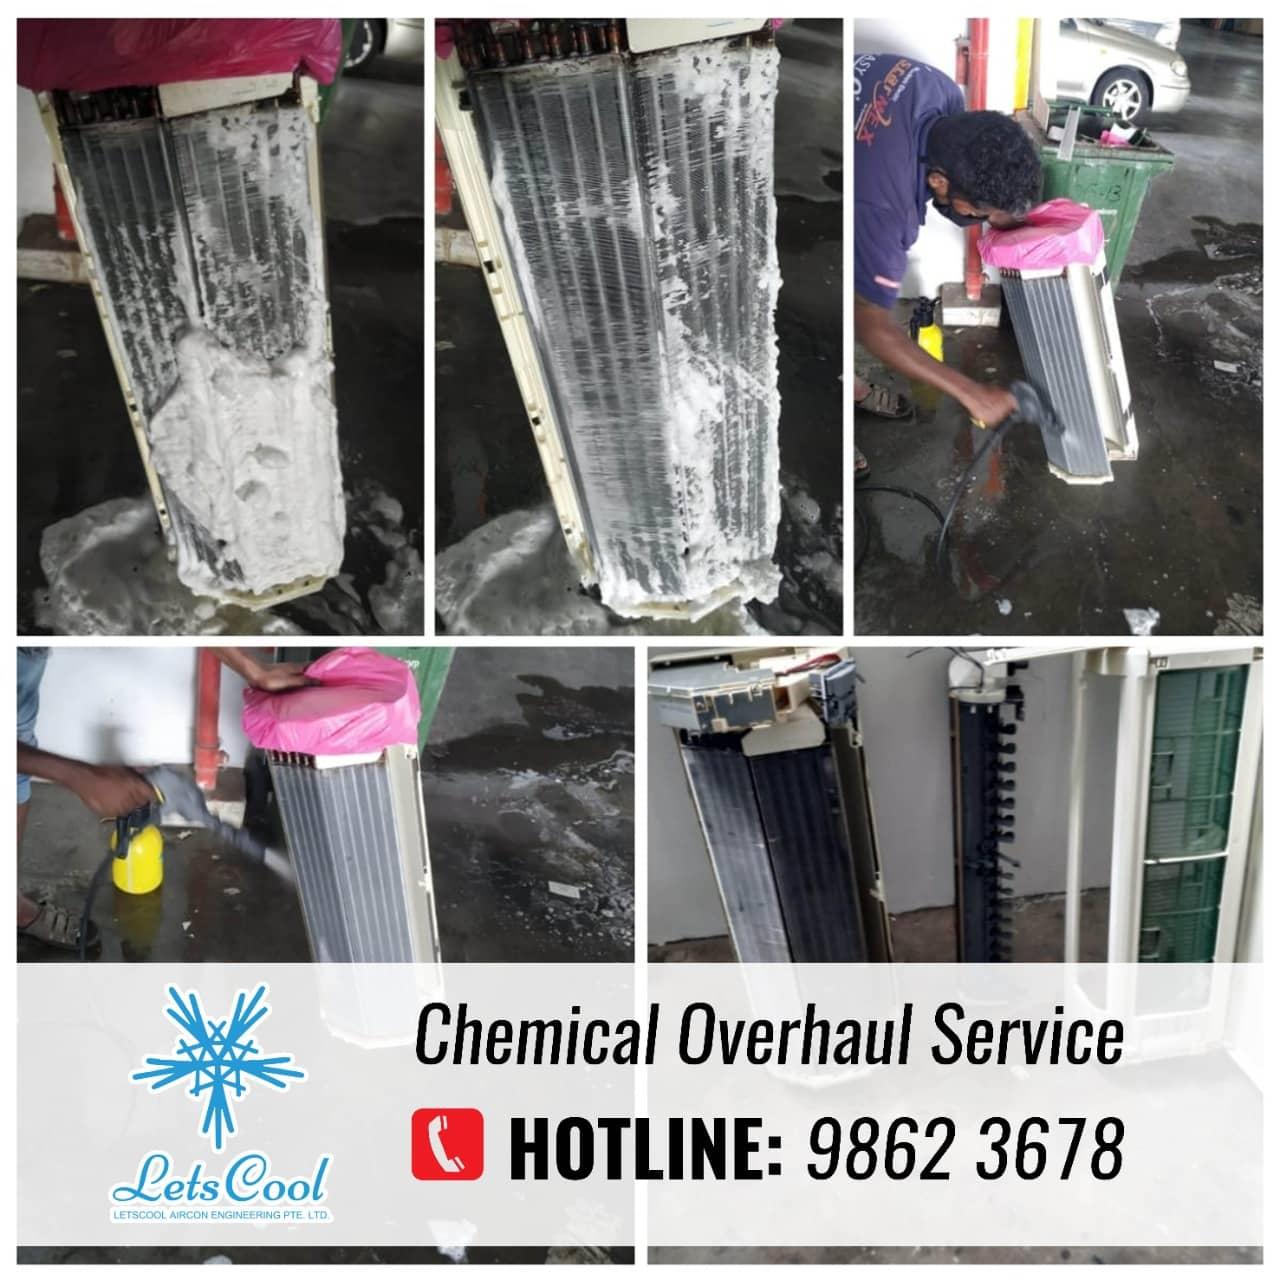 Aircon chemical overhaul service